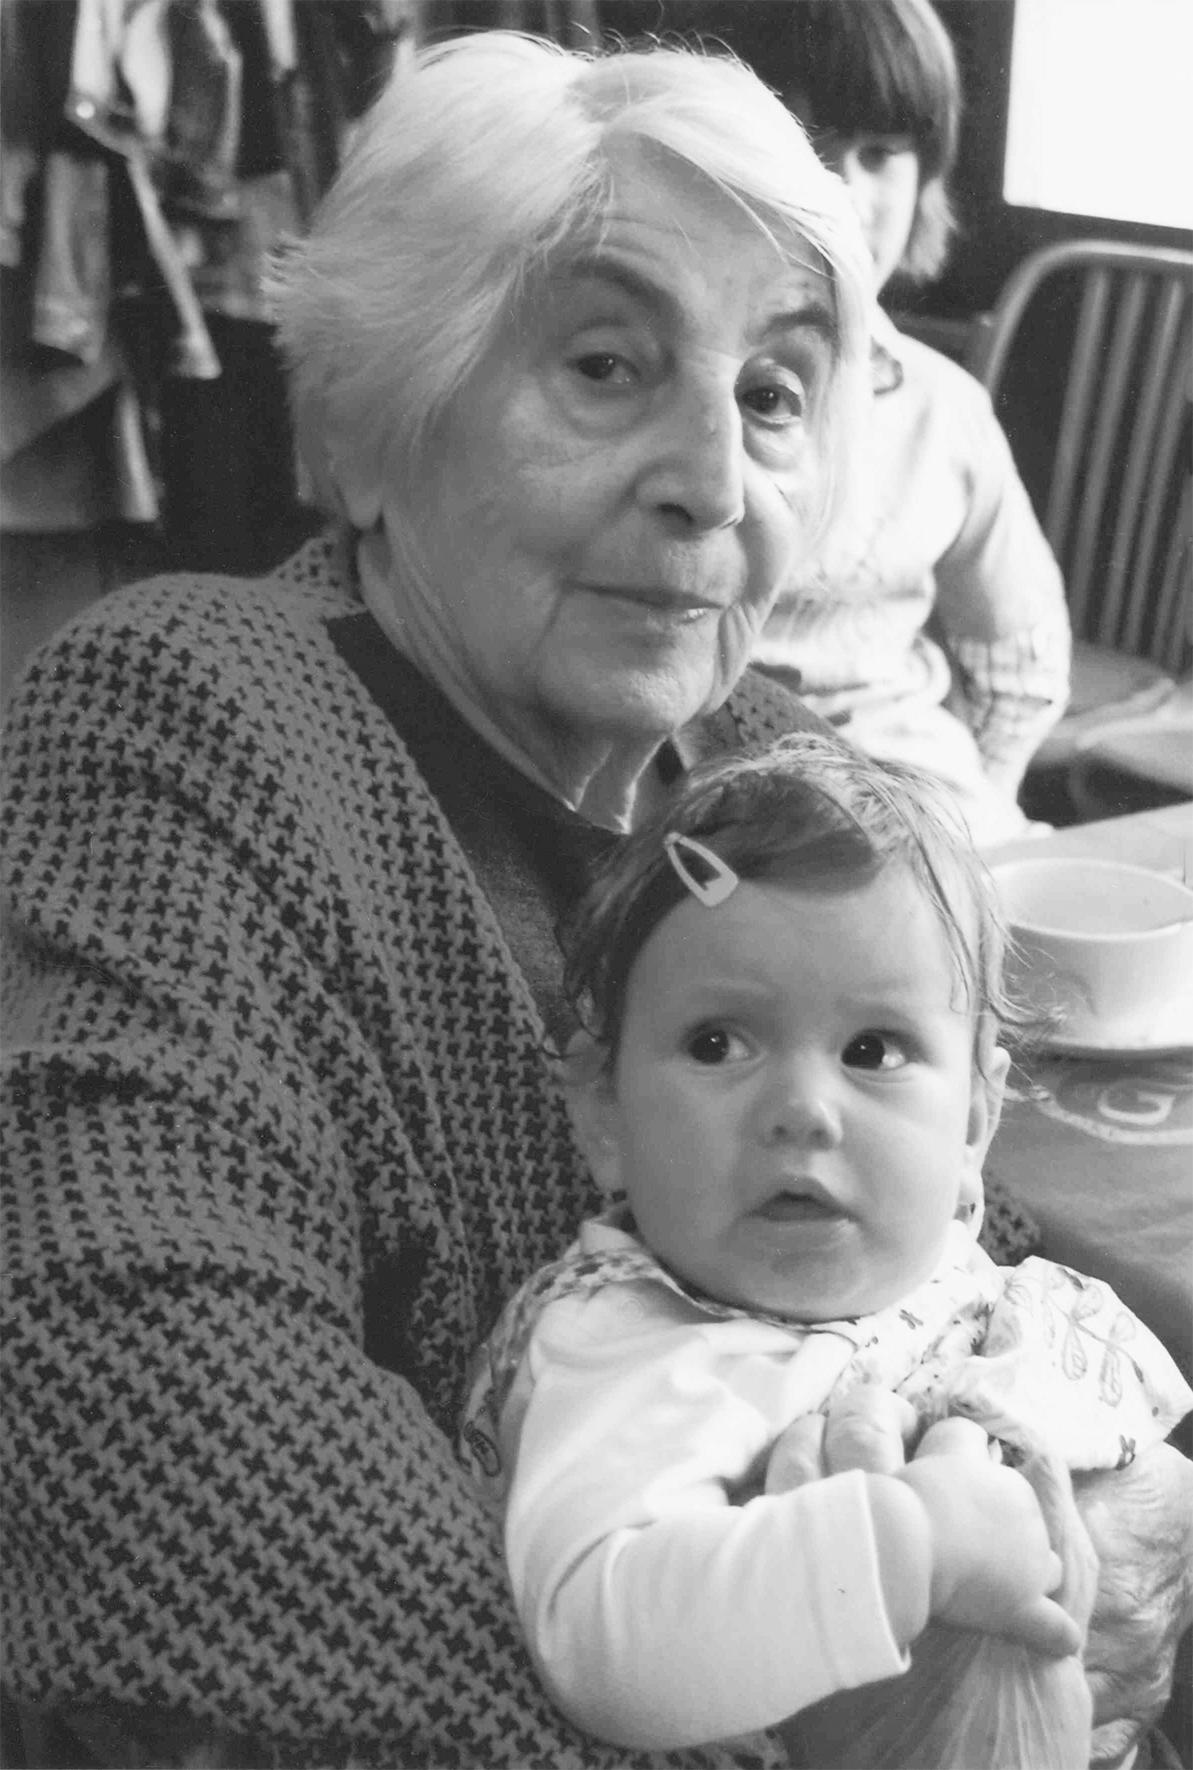 Helena Jockel larger image and caption